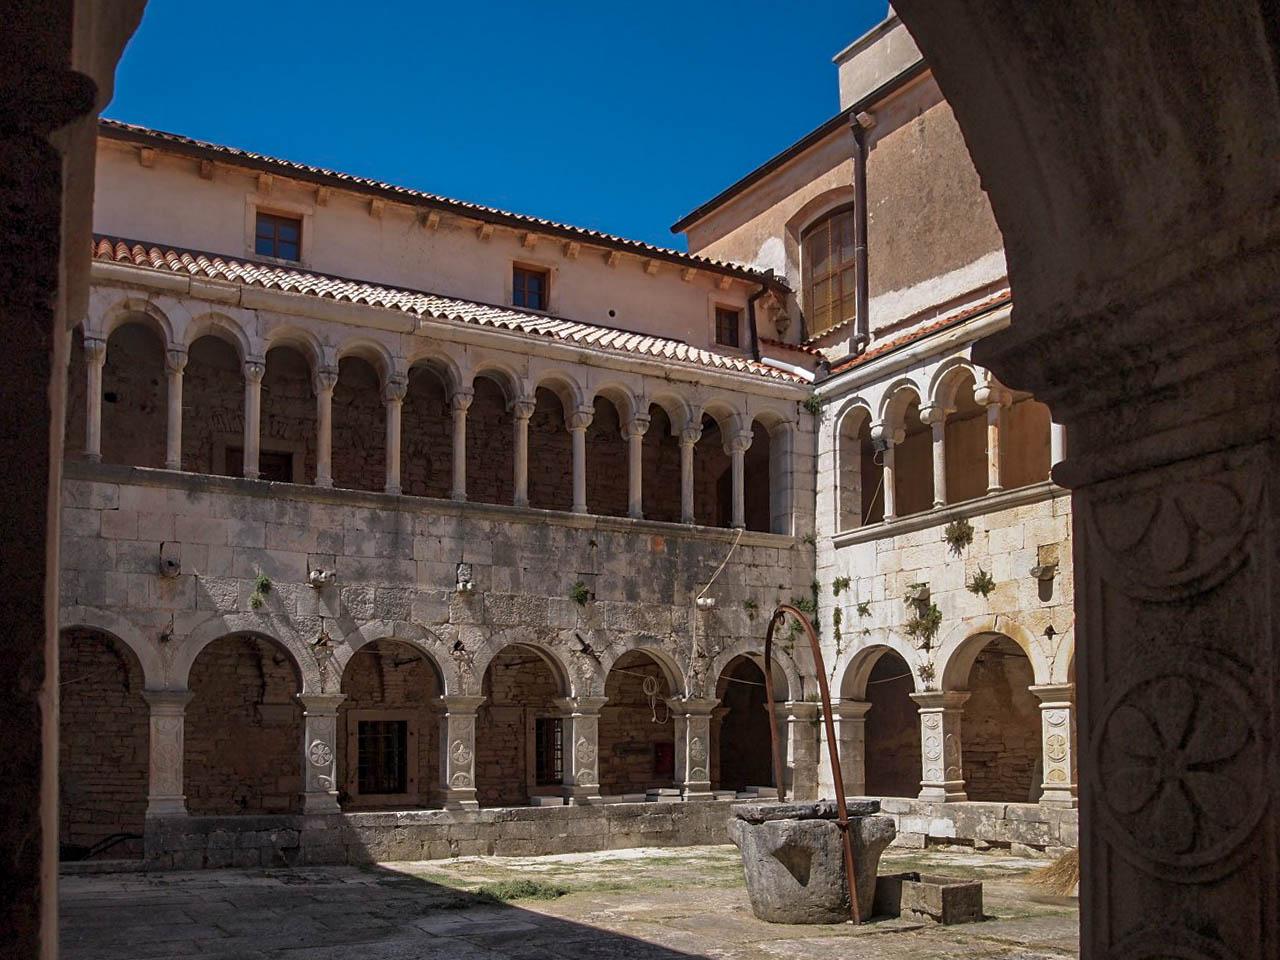 The romanesque cloister in Sv Petar u Sumi